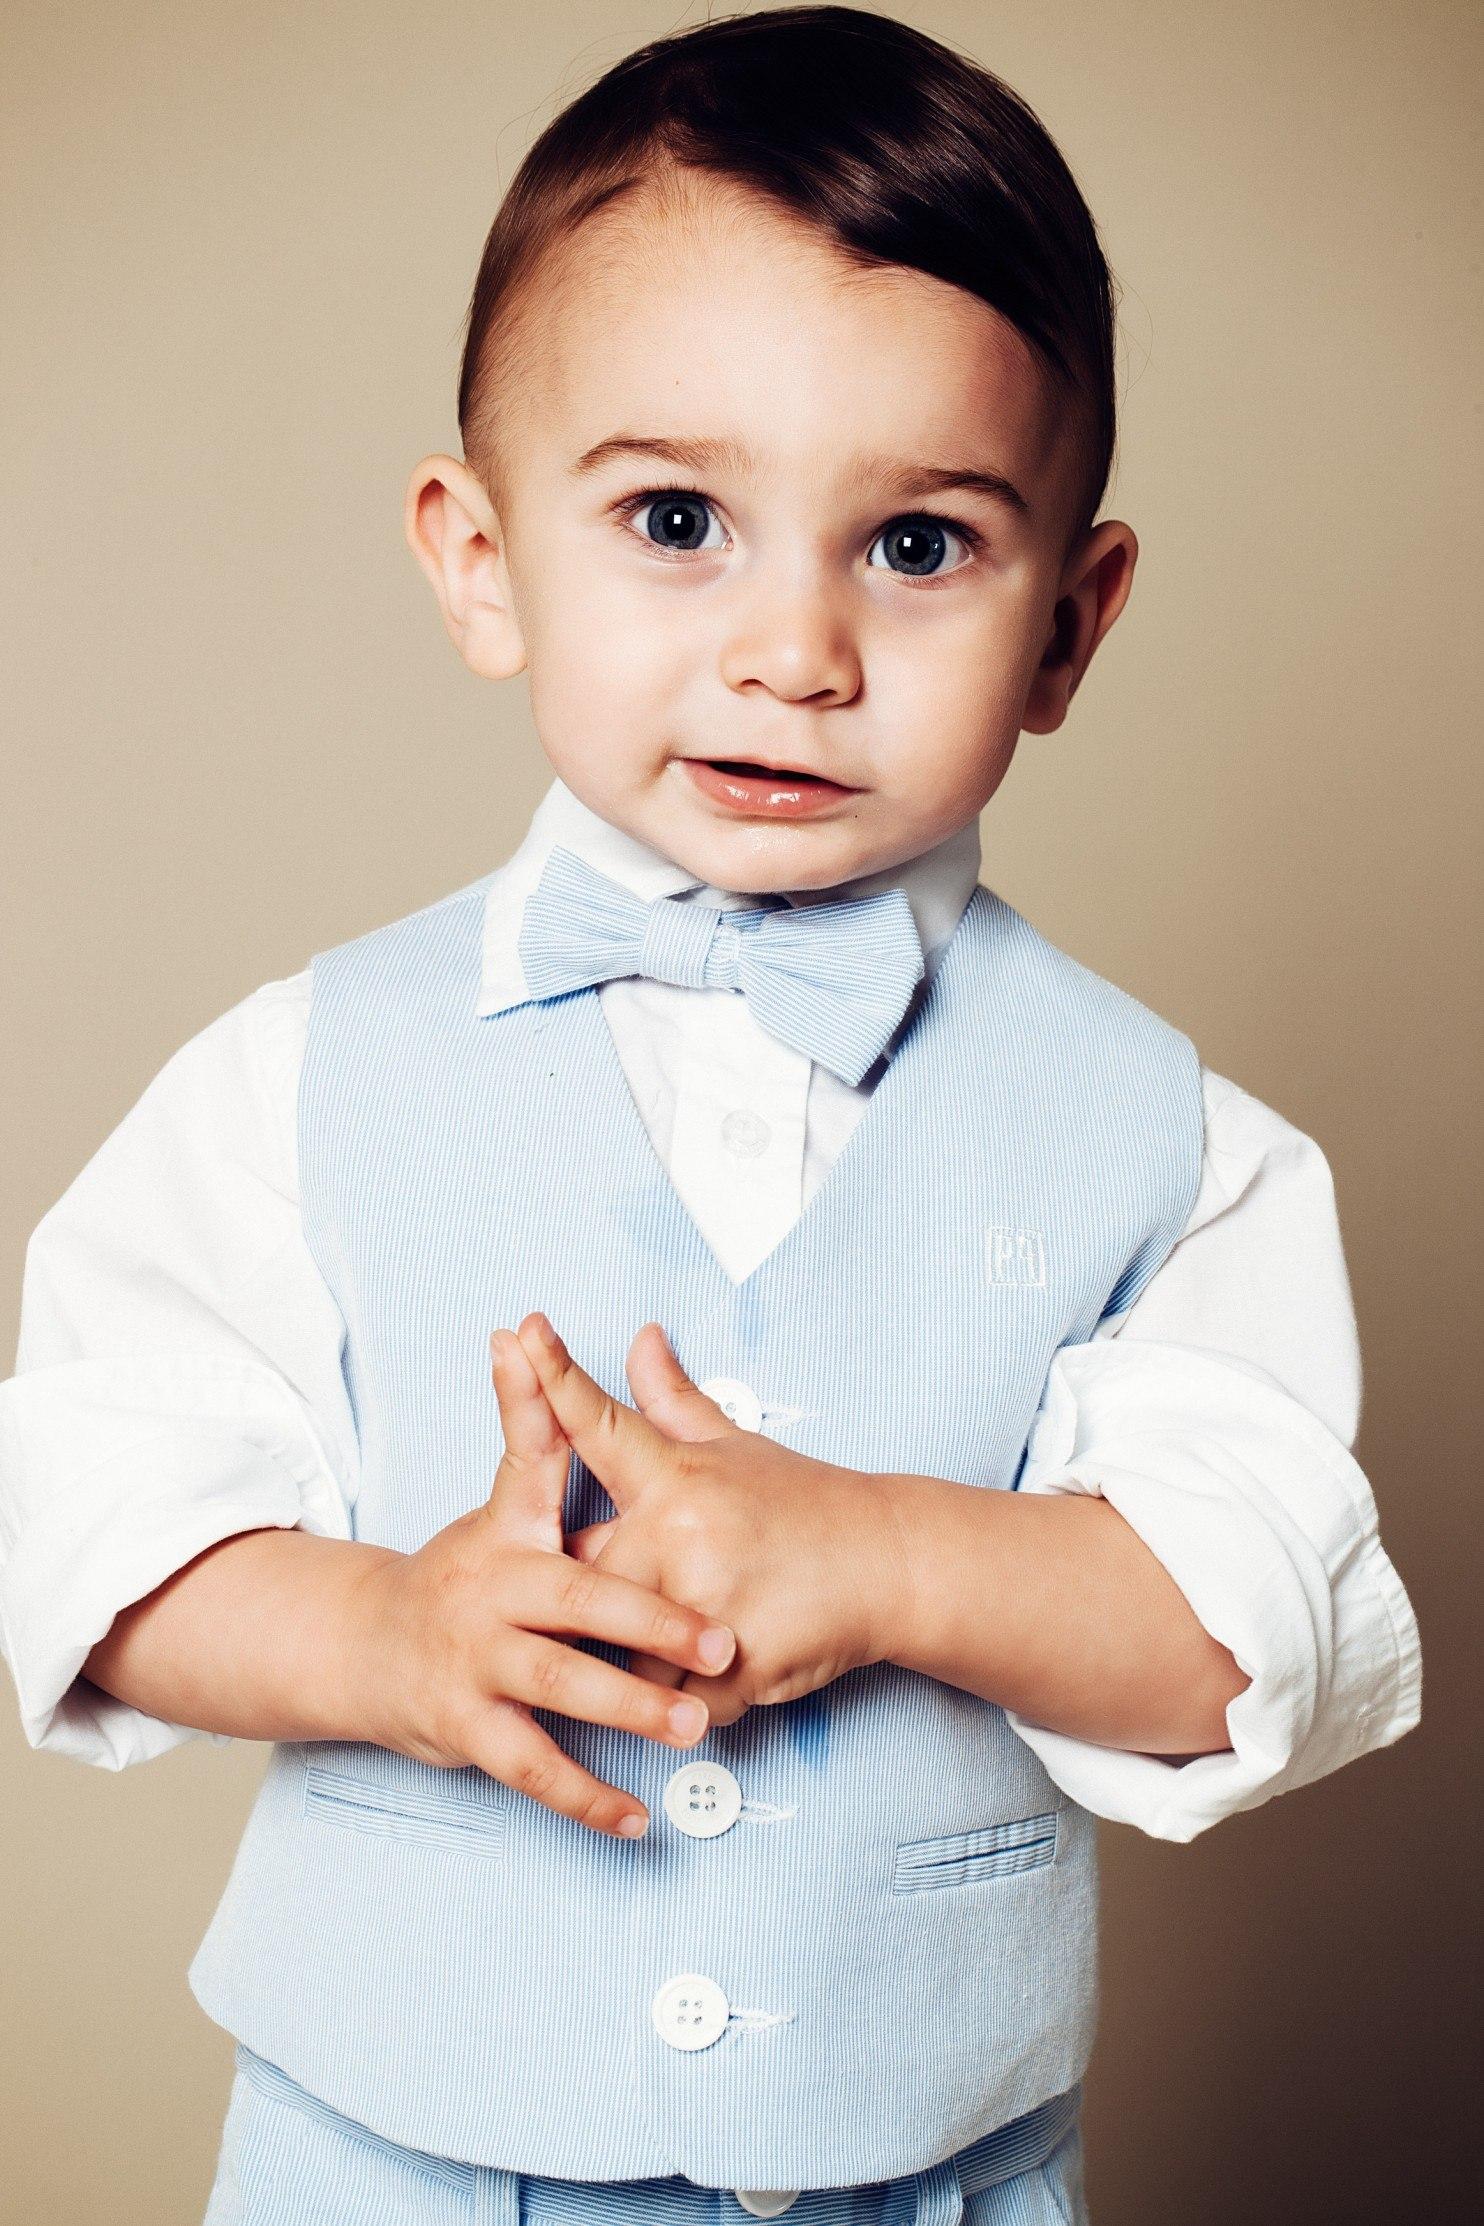 kids-children-fashion-photography-photographer-ruth-rose-west-london-rafi-1-1484x2226.jpg